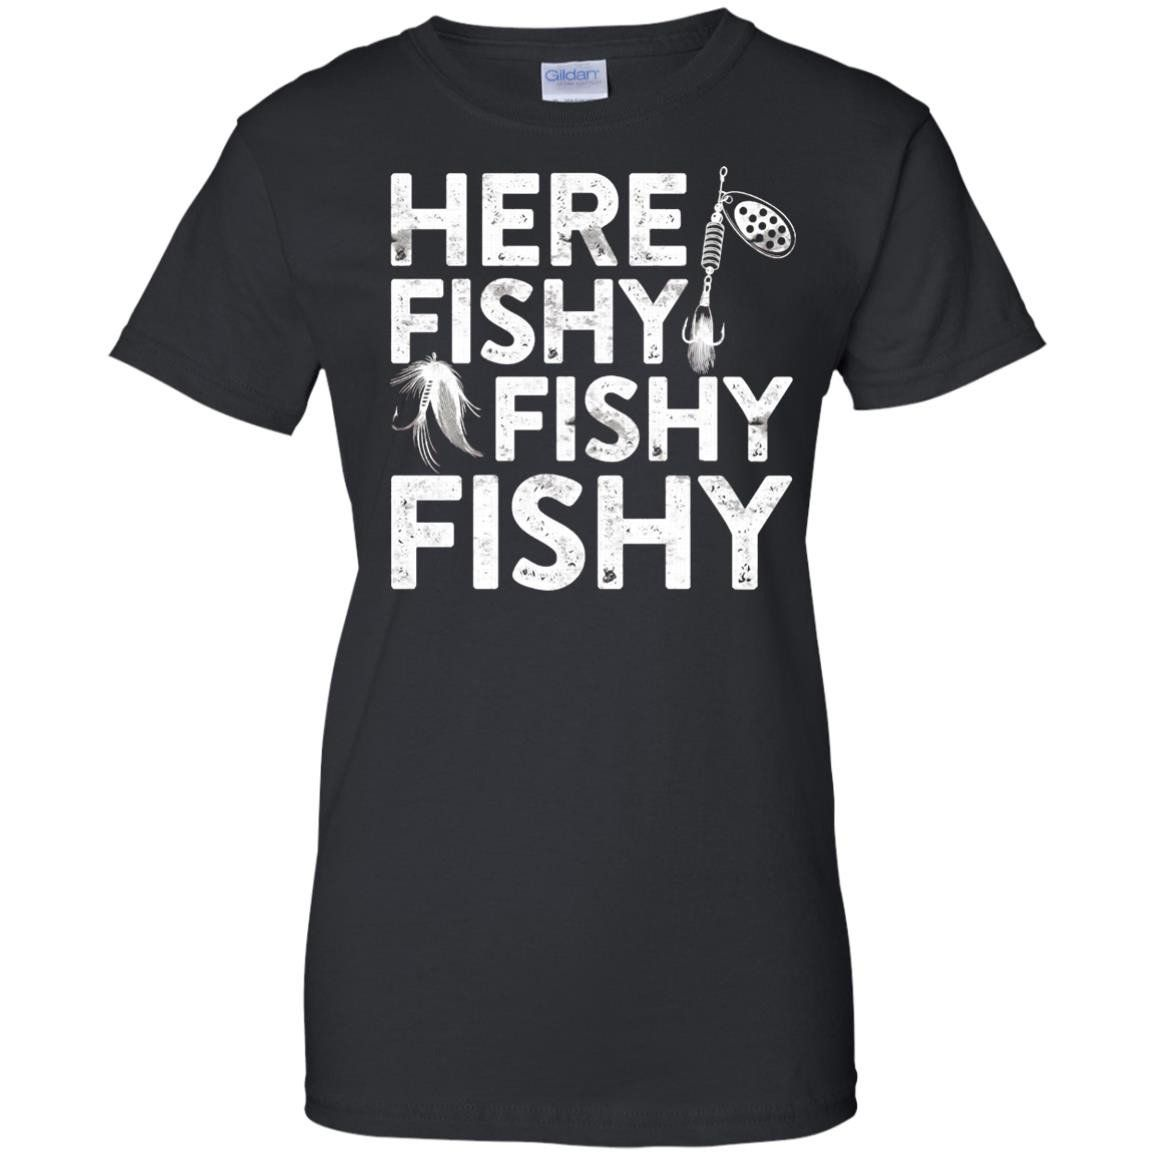 ca14d32b3 Here Fishy Fishy Fishy T-Shirt Funny Fisherman Shirt | Products | T ...